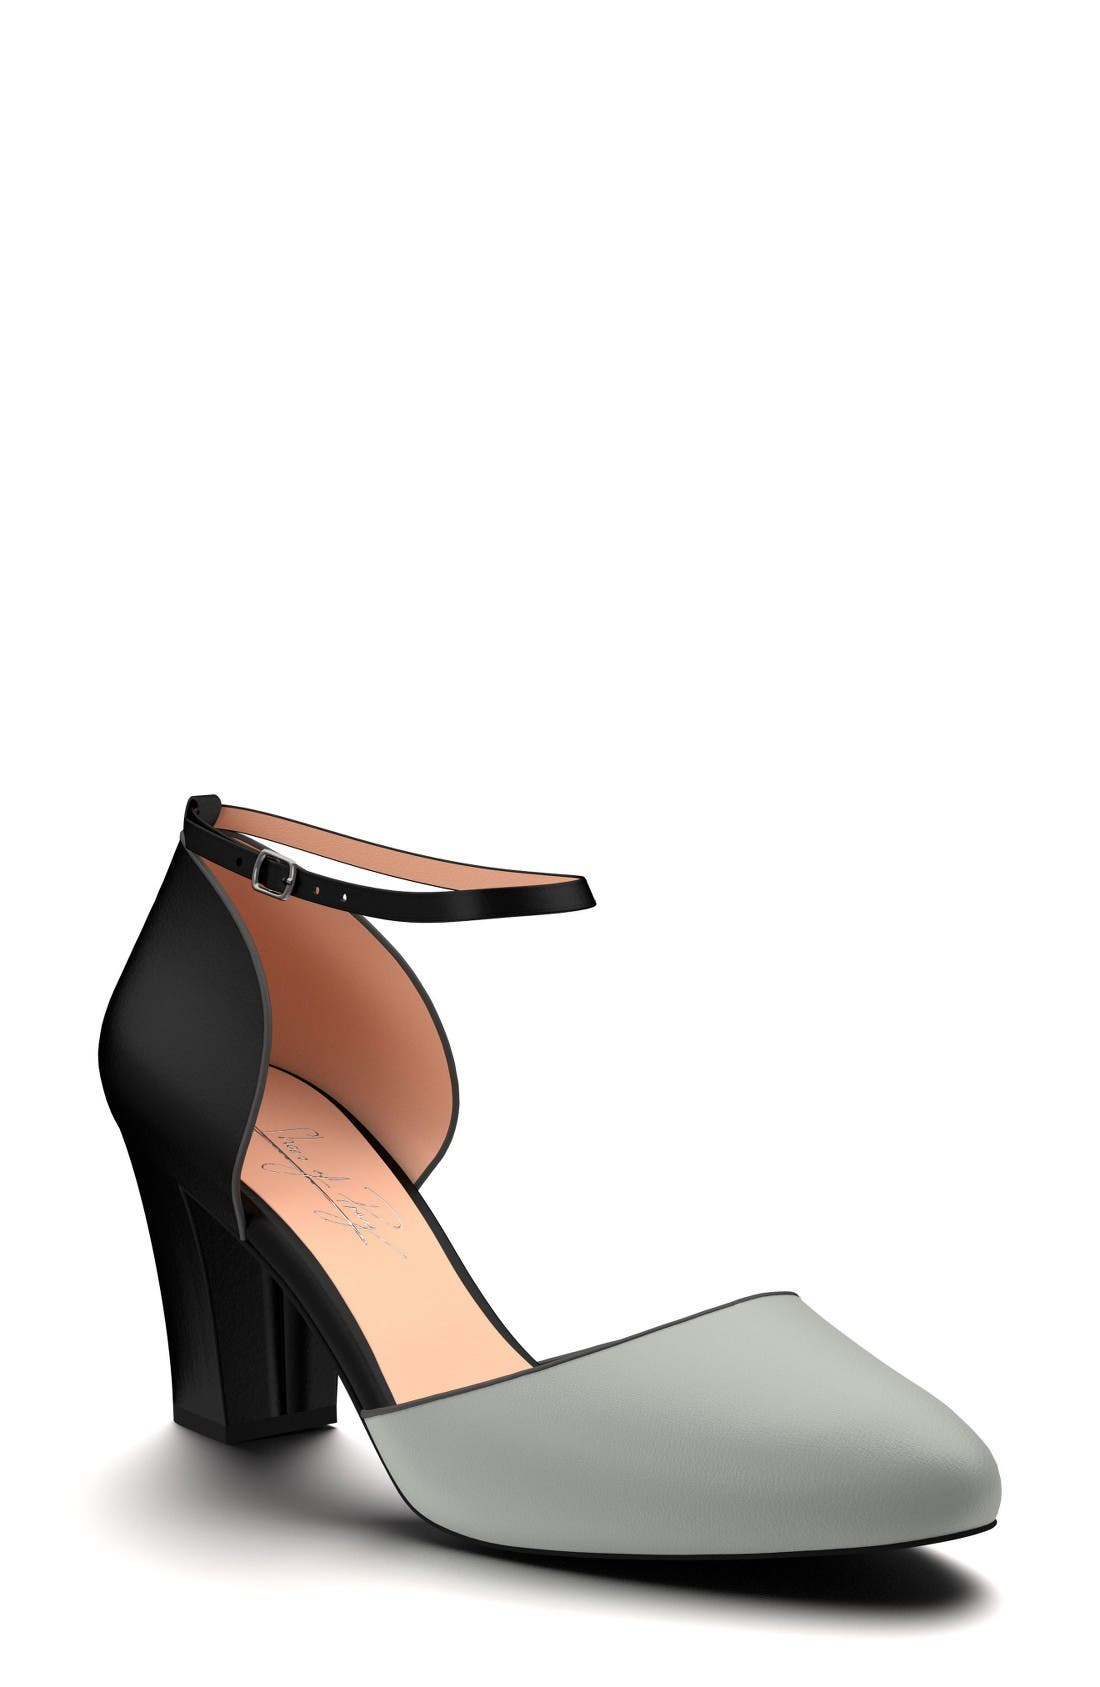 Main Image - Shoes of Prey Block Heel d'Orsay Pump (Women)